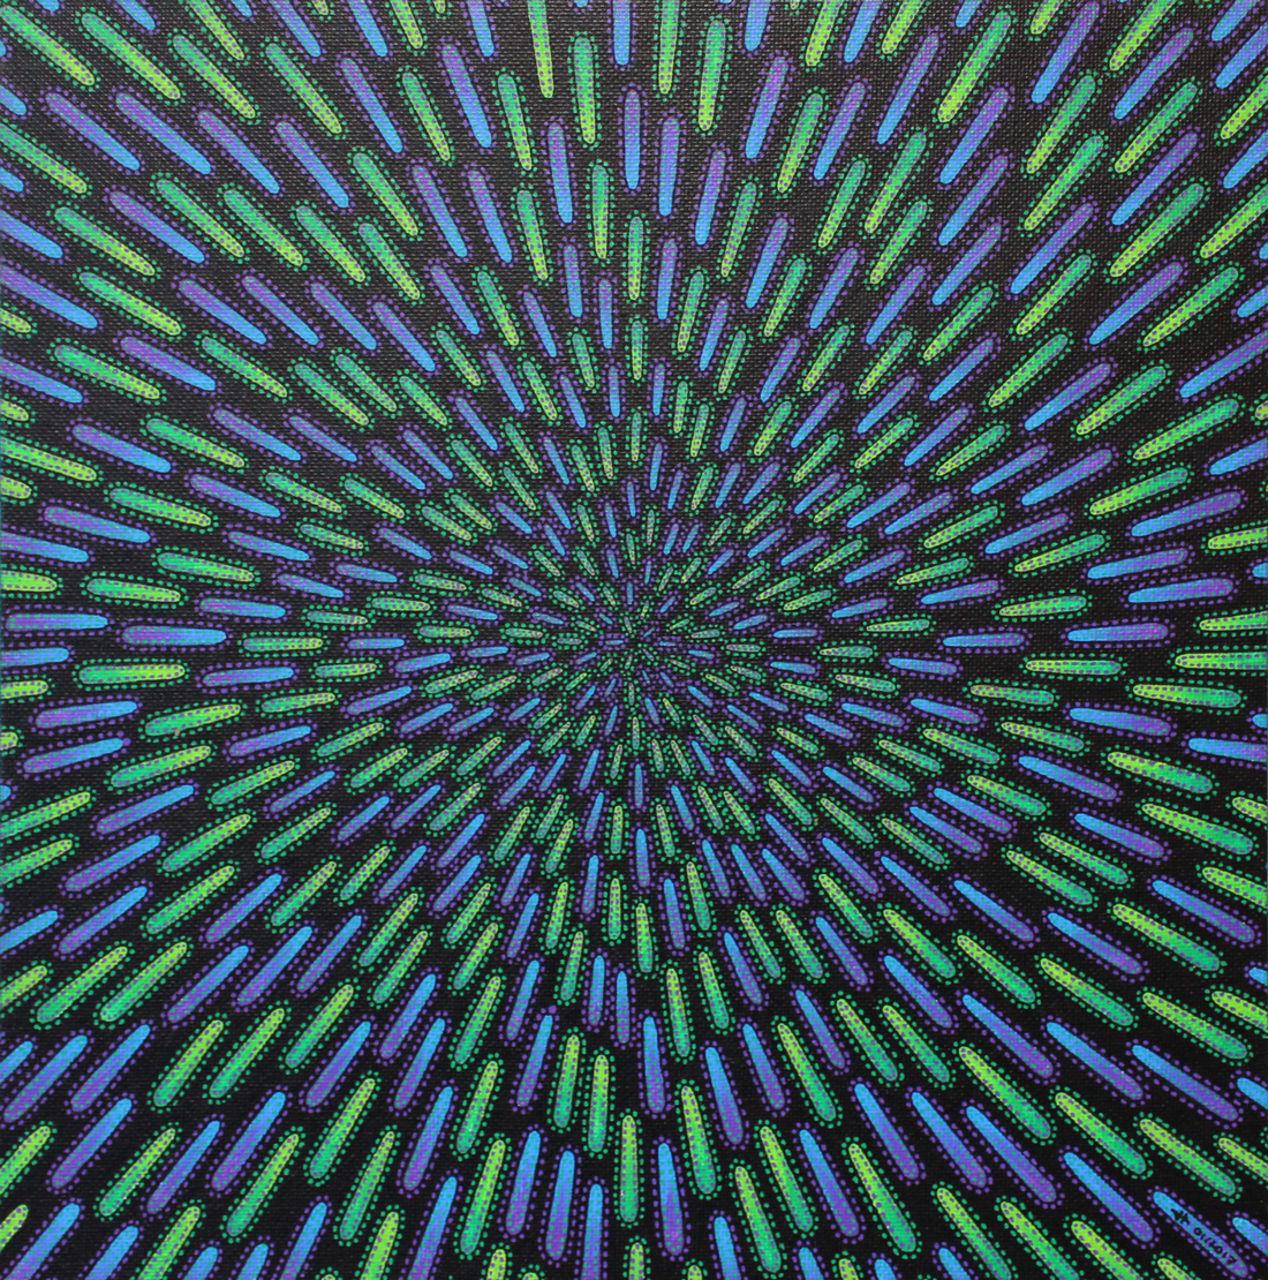 Jonathan-Pradillon Particule verte et violette